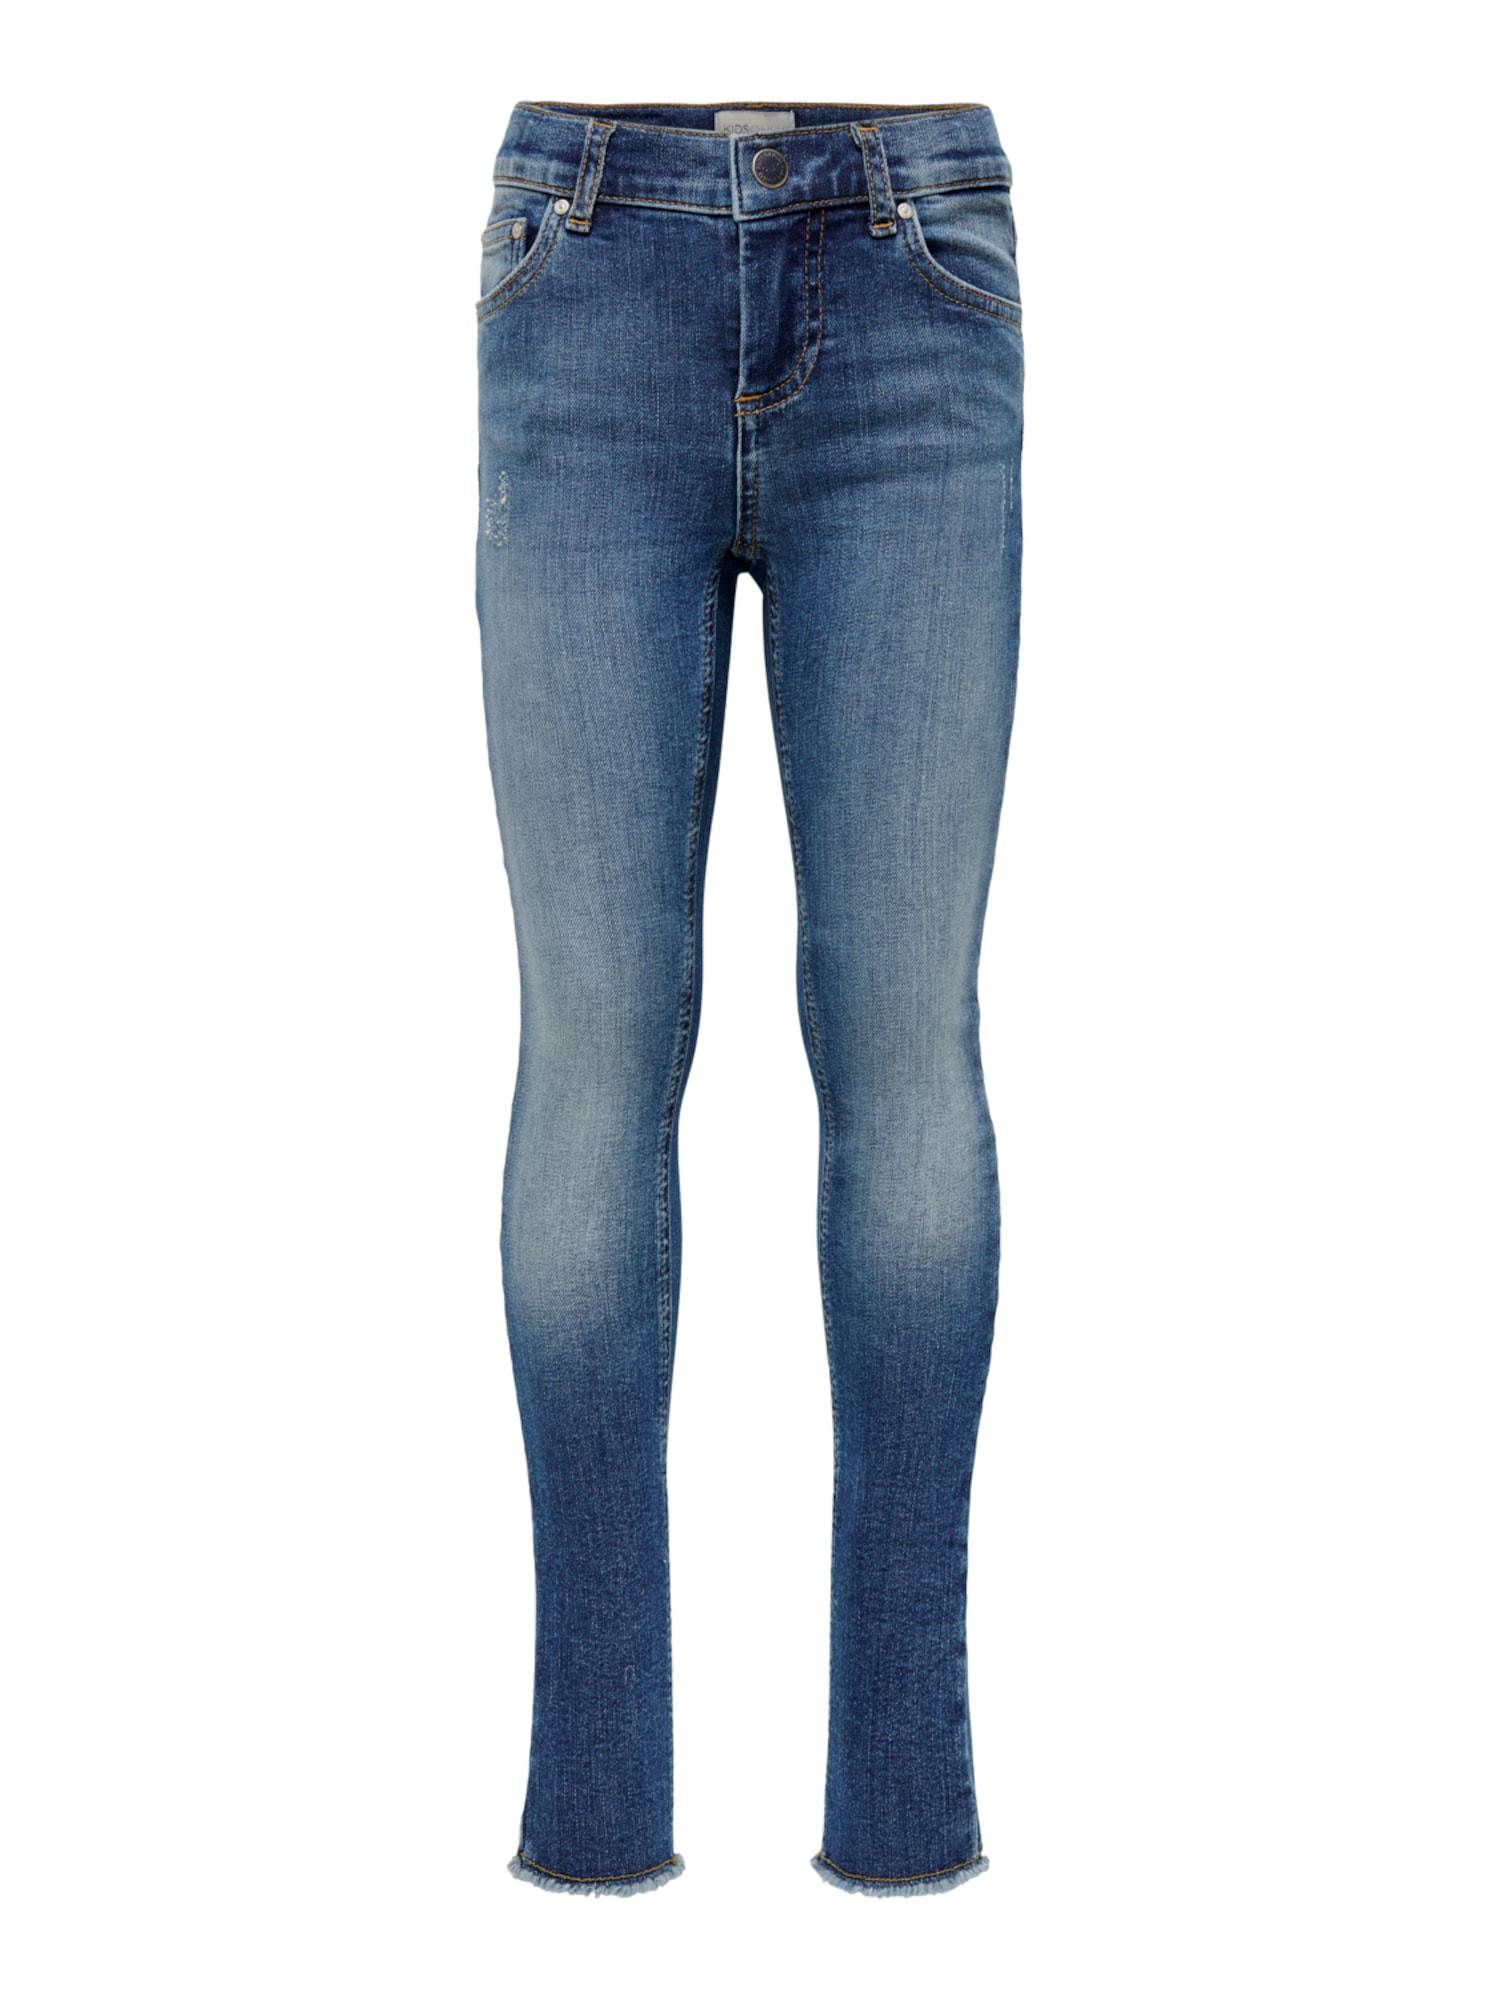 KIDS ONLY Džinsai tamsiai (džinso) mėlyna